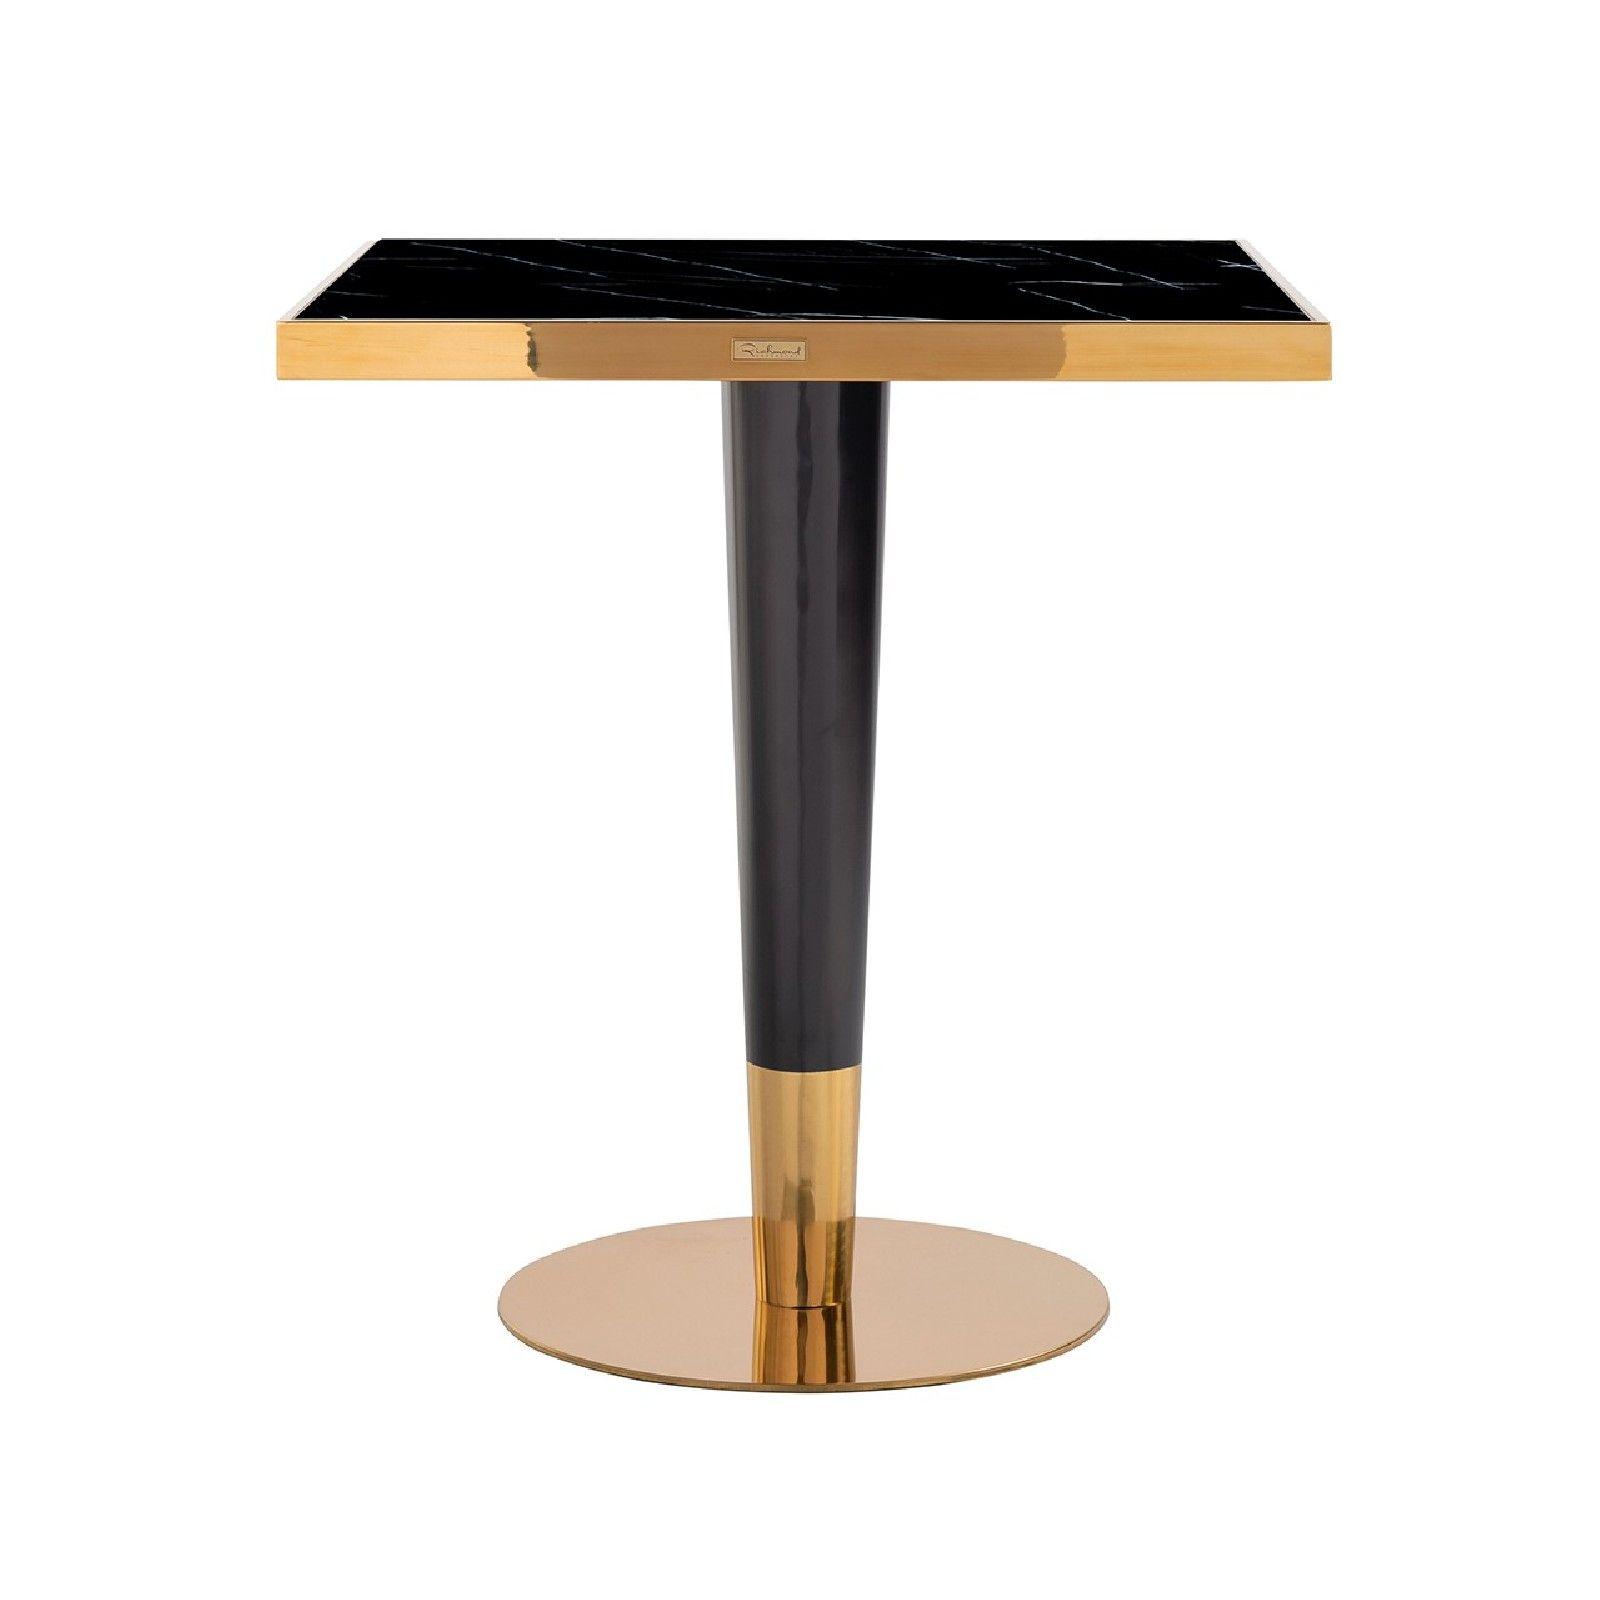 Table a diner Can Roca square black 70x70 Meuble Déco Tendance - 481